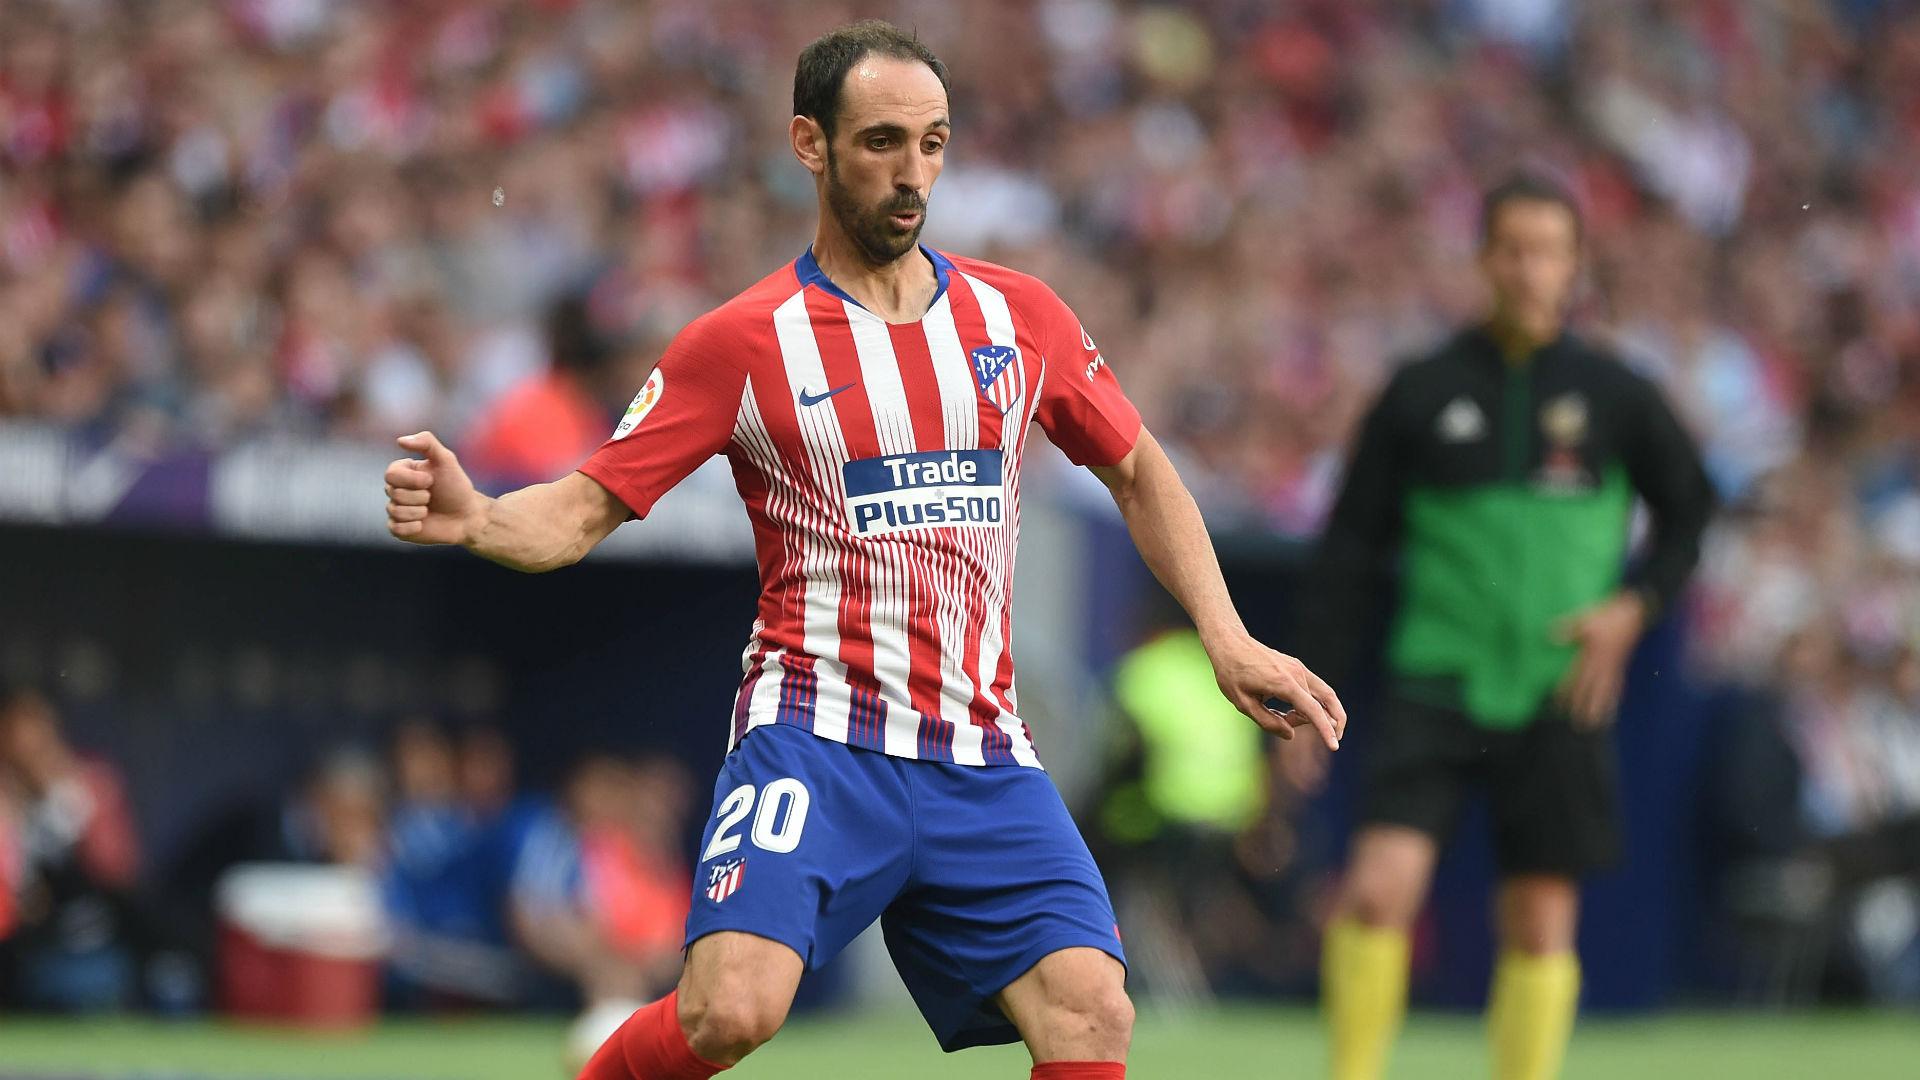 Atletico Madrid exodus continues as Juanfran announces departure